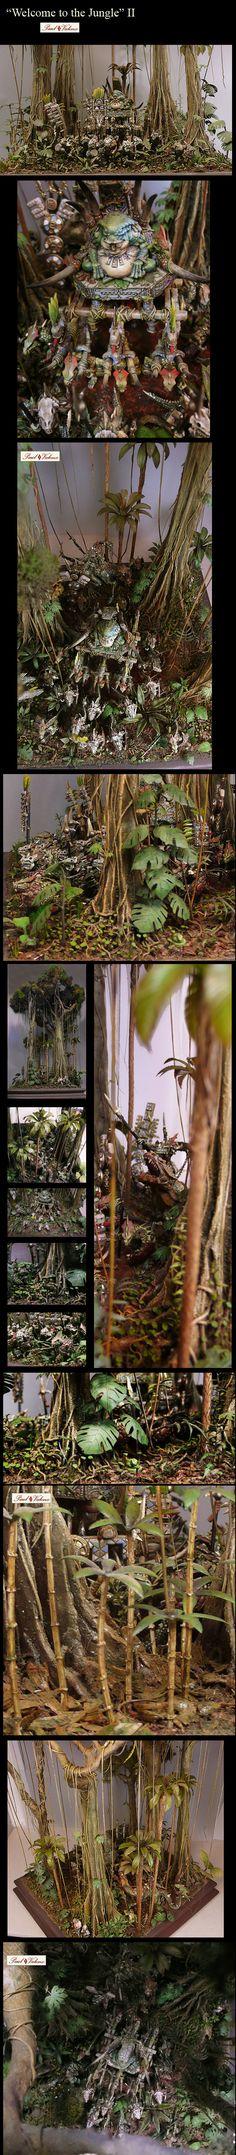 Warhammer Fantasy: Welcome to the Jungle II - Slann with Skinks